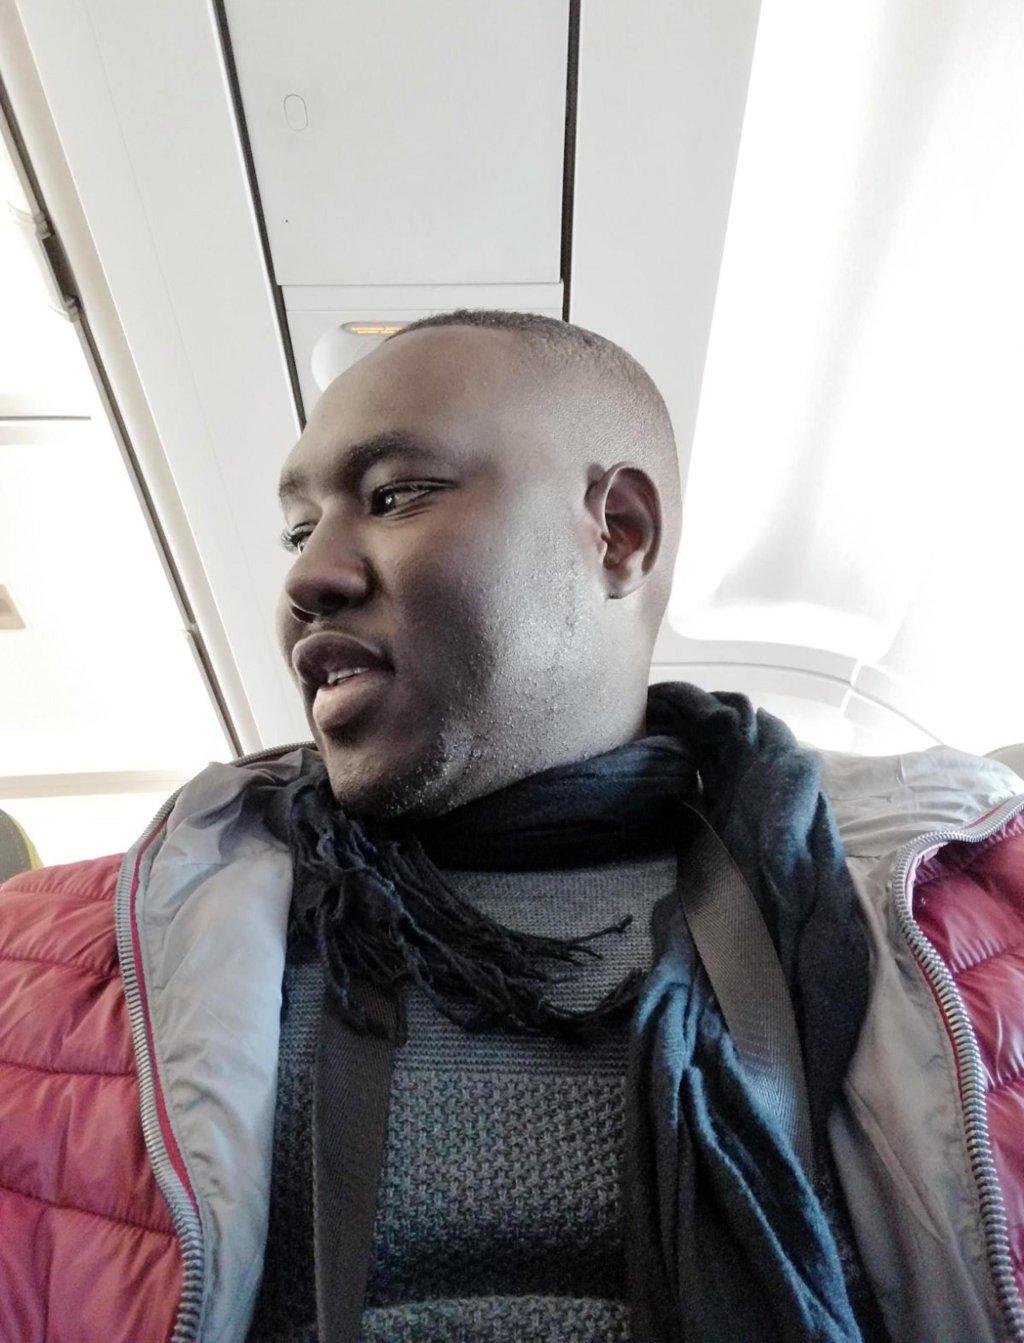 ansa / مهاجر سنغالي يروي قصة عودته من إيطاليا لبلده لمكافحة الهجرة